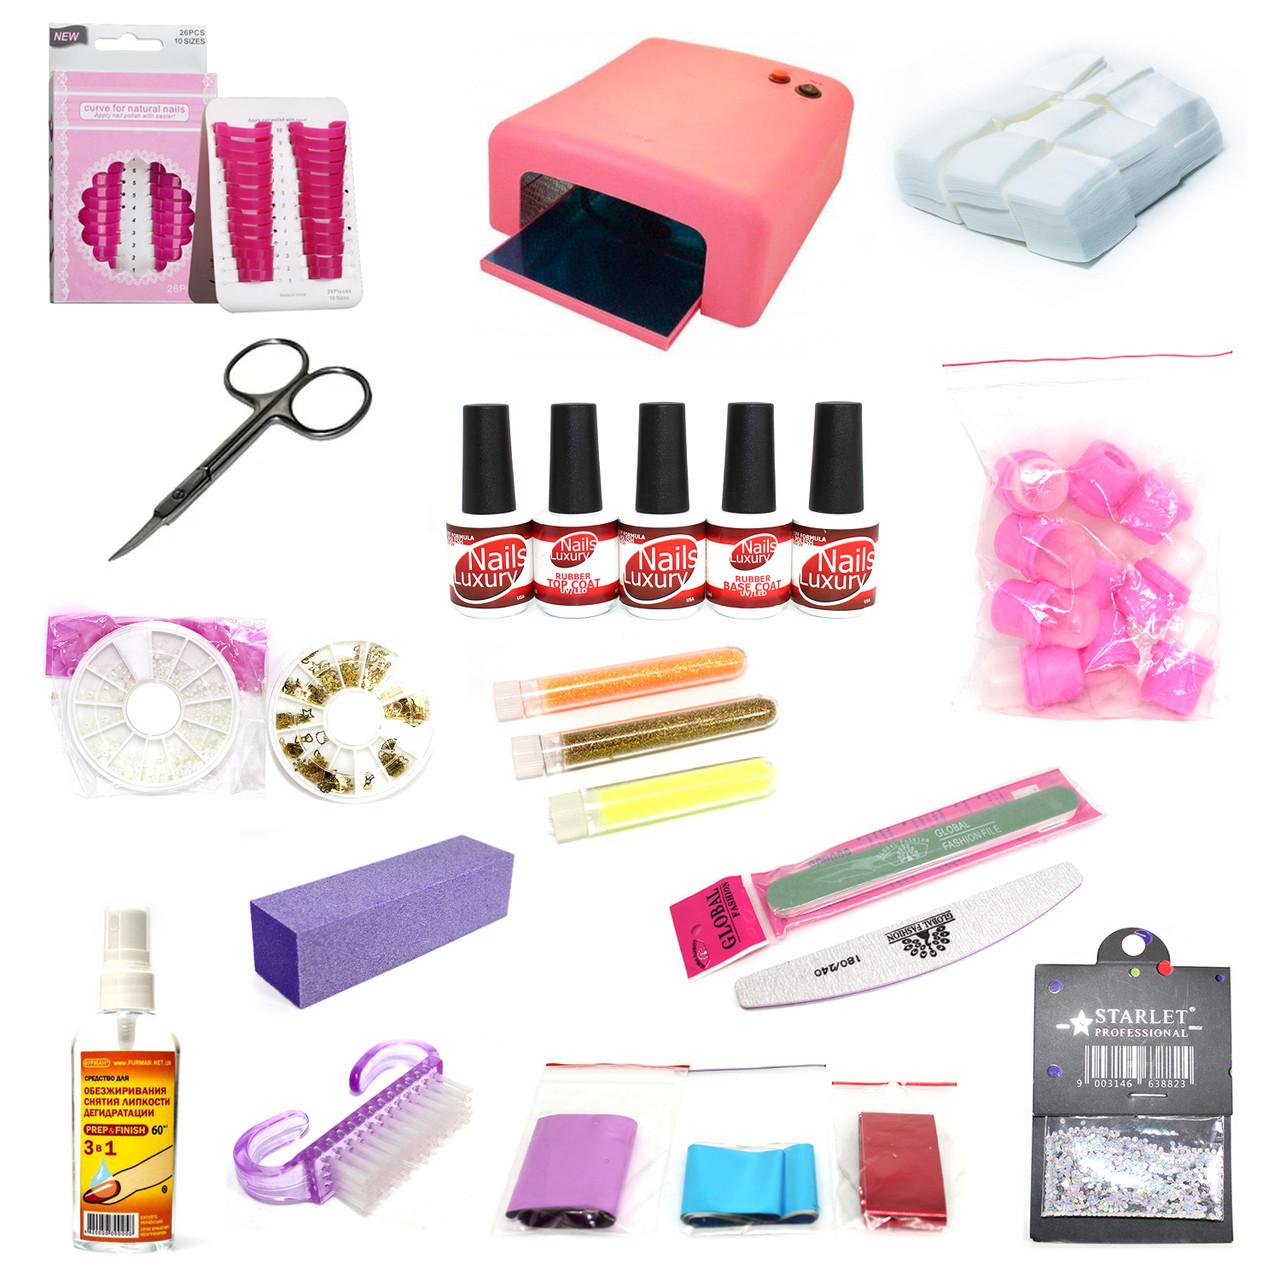 Набор для маникюра Nails Luxury №2 с Лампой 36 Вт. розовая